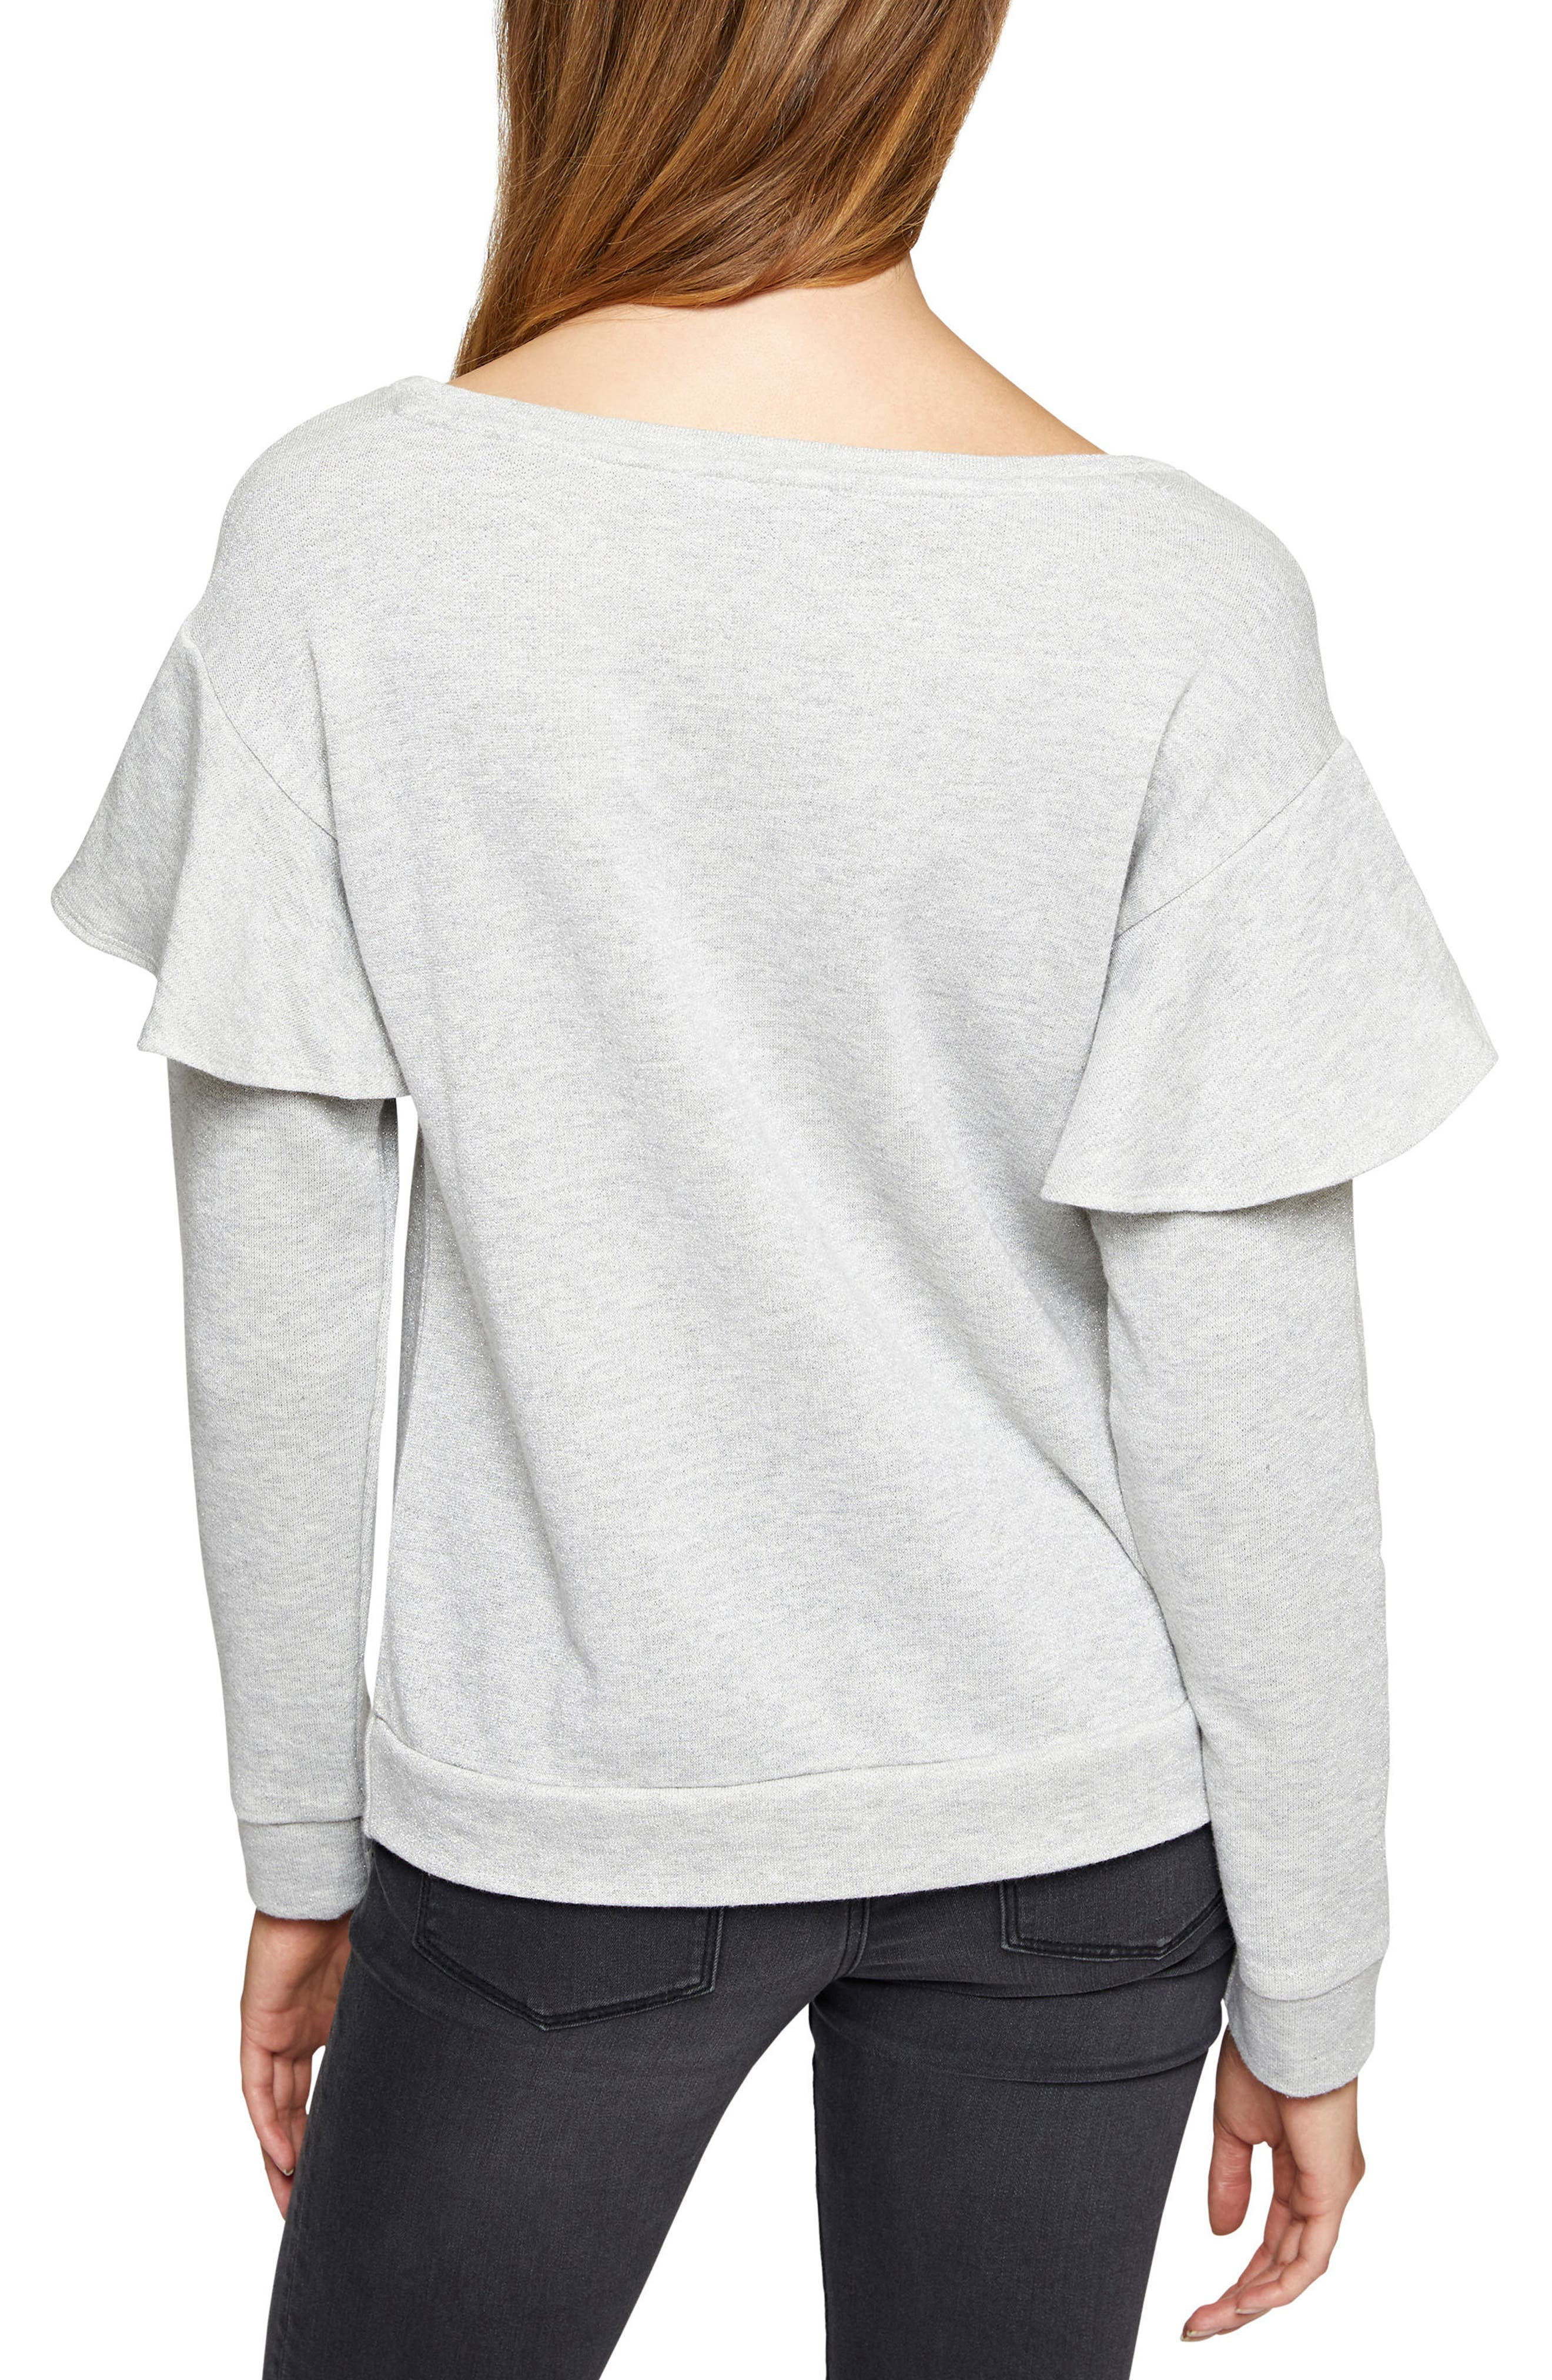 Dominique Metallic Sweatshirt,                             Alternate thumbnail 4, color,